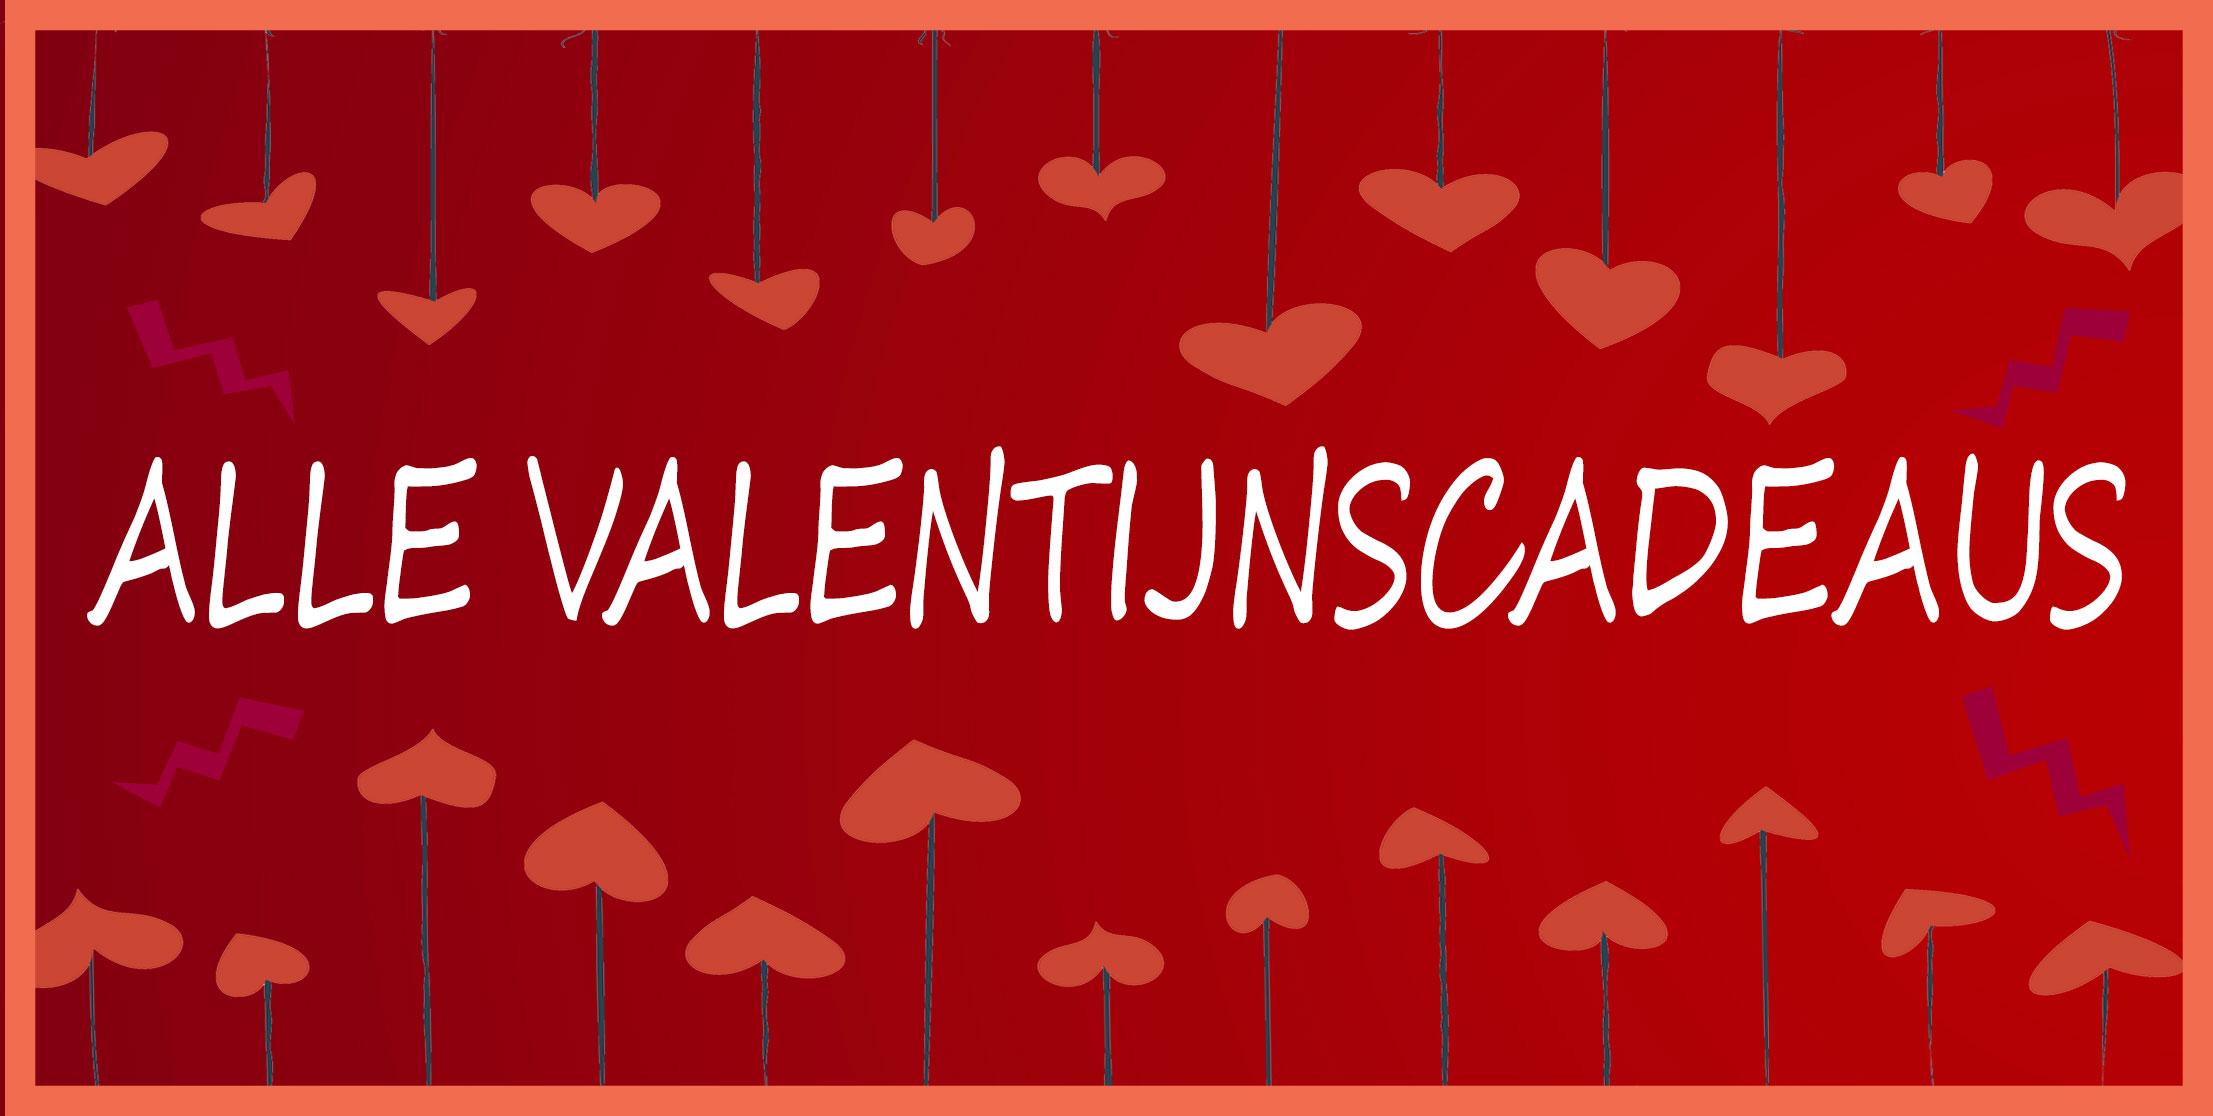 valentijnsgedichten